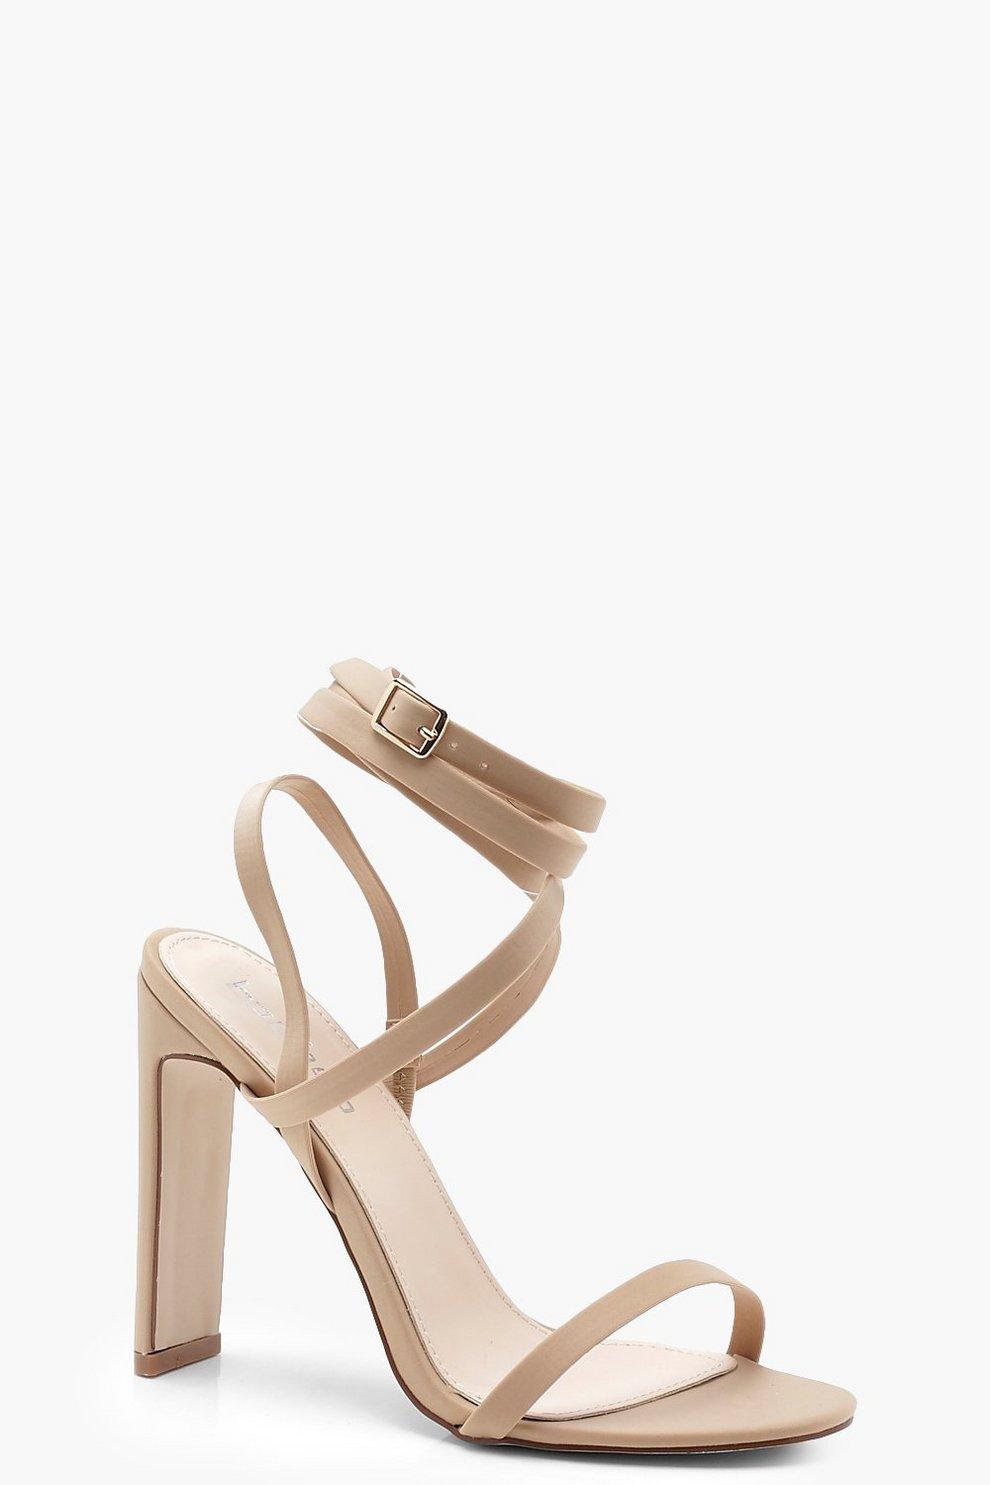 6406fdc4a44b Skinny Block Heel Wrap Strap Sandals